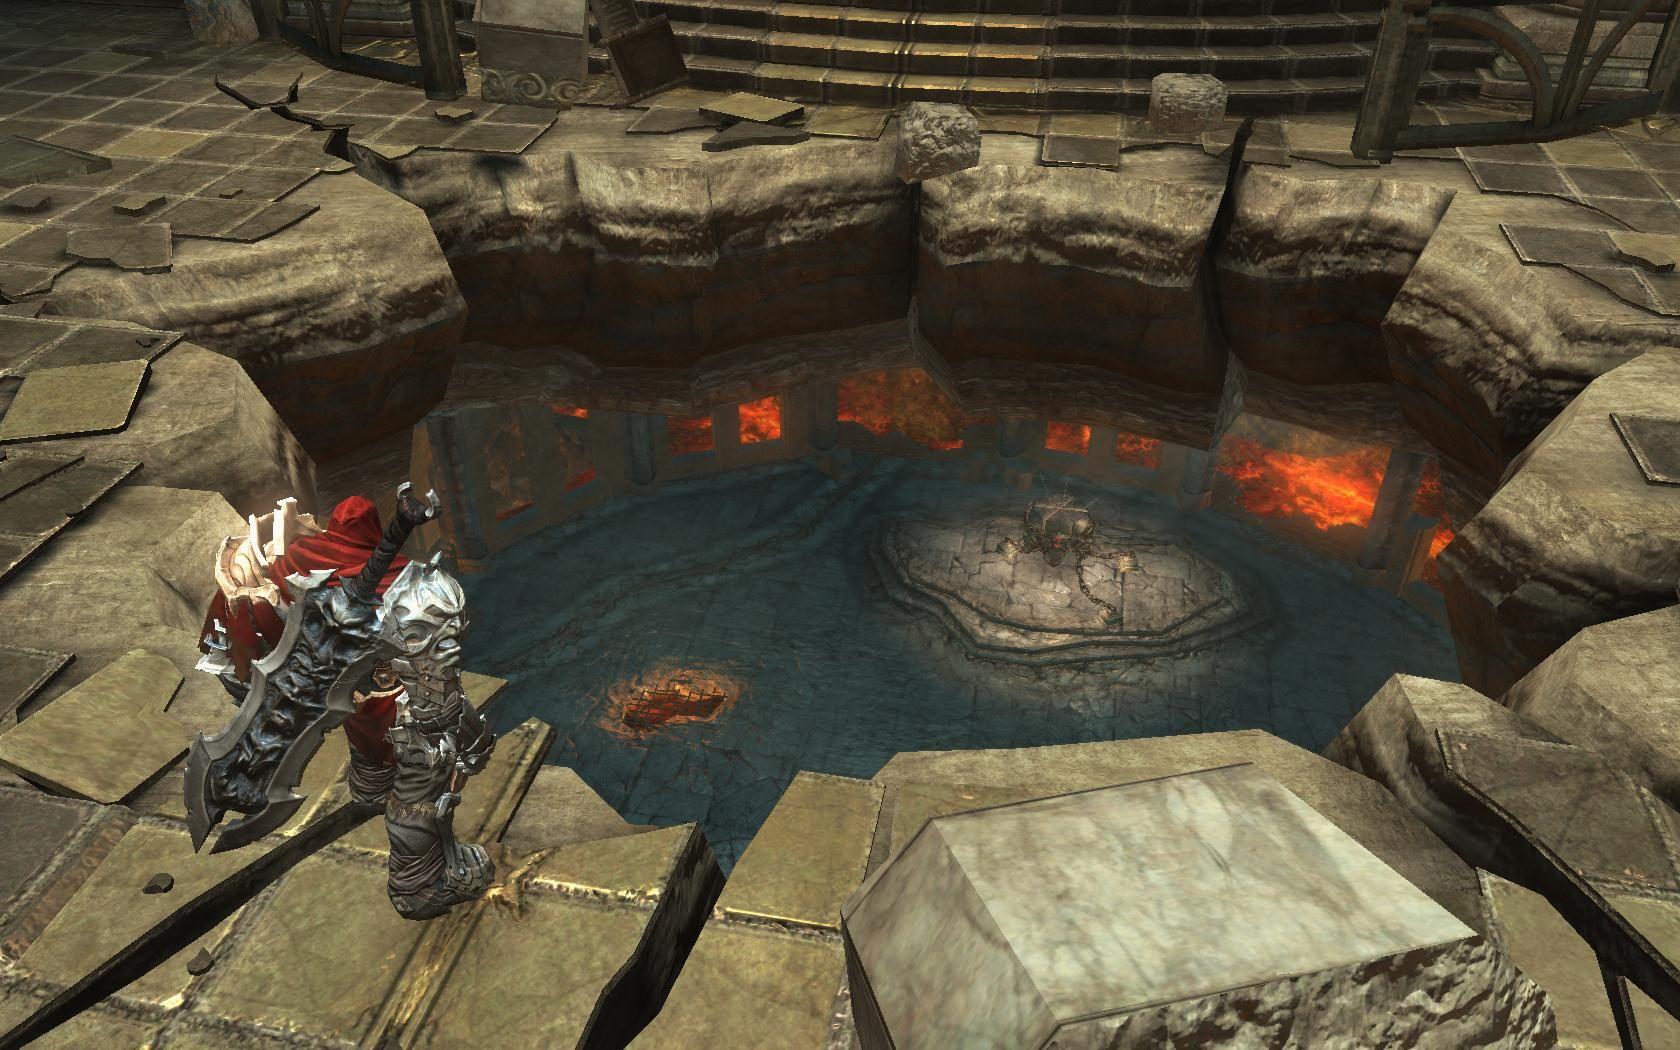 No Darksiders demo or DLC planned